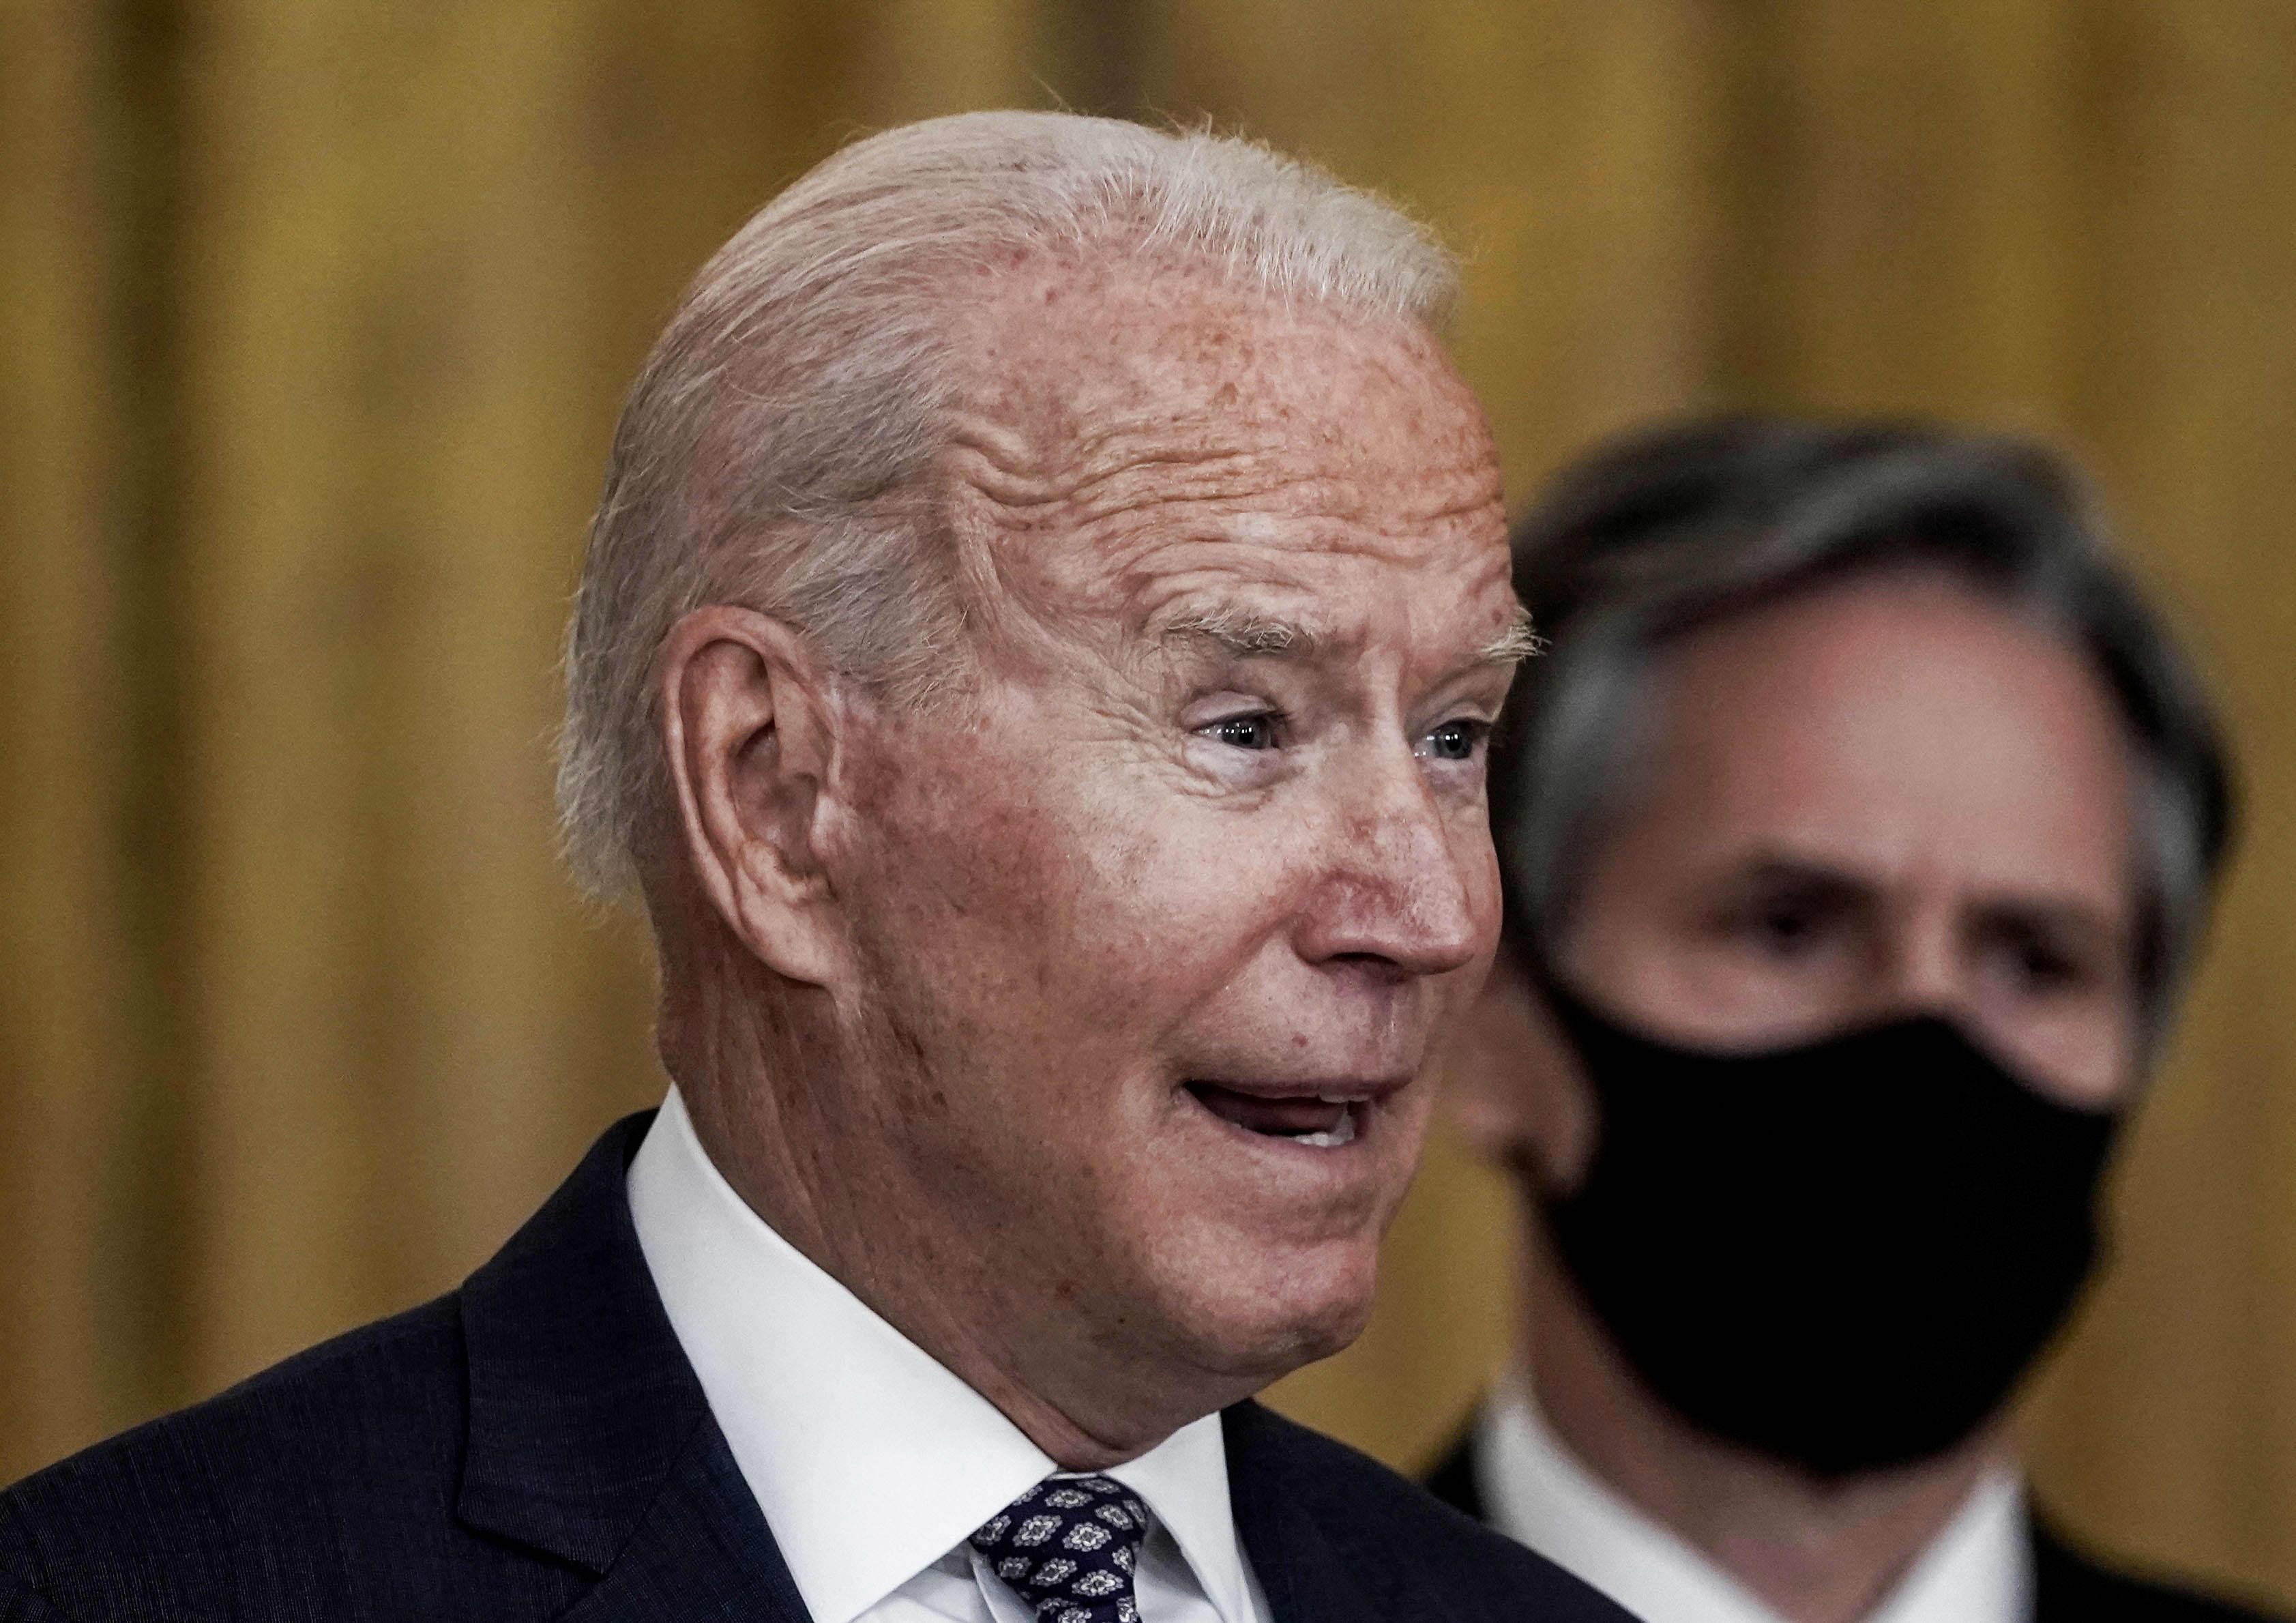 President Joe Biden's job approval ratings drop as crisis in Afghanistan  mounts